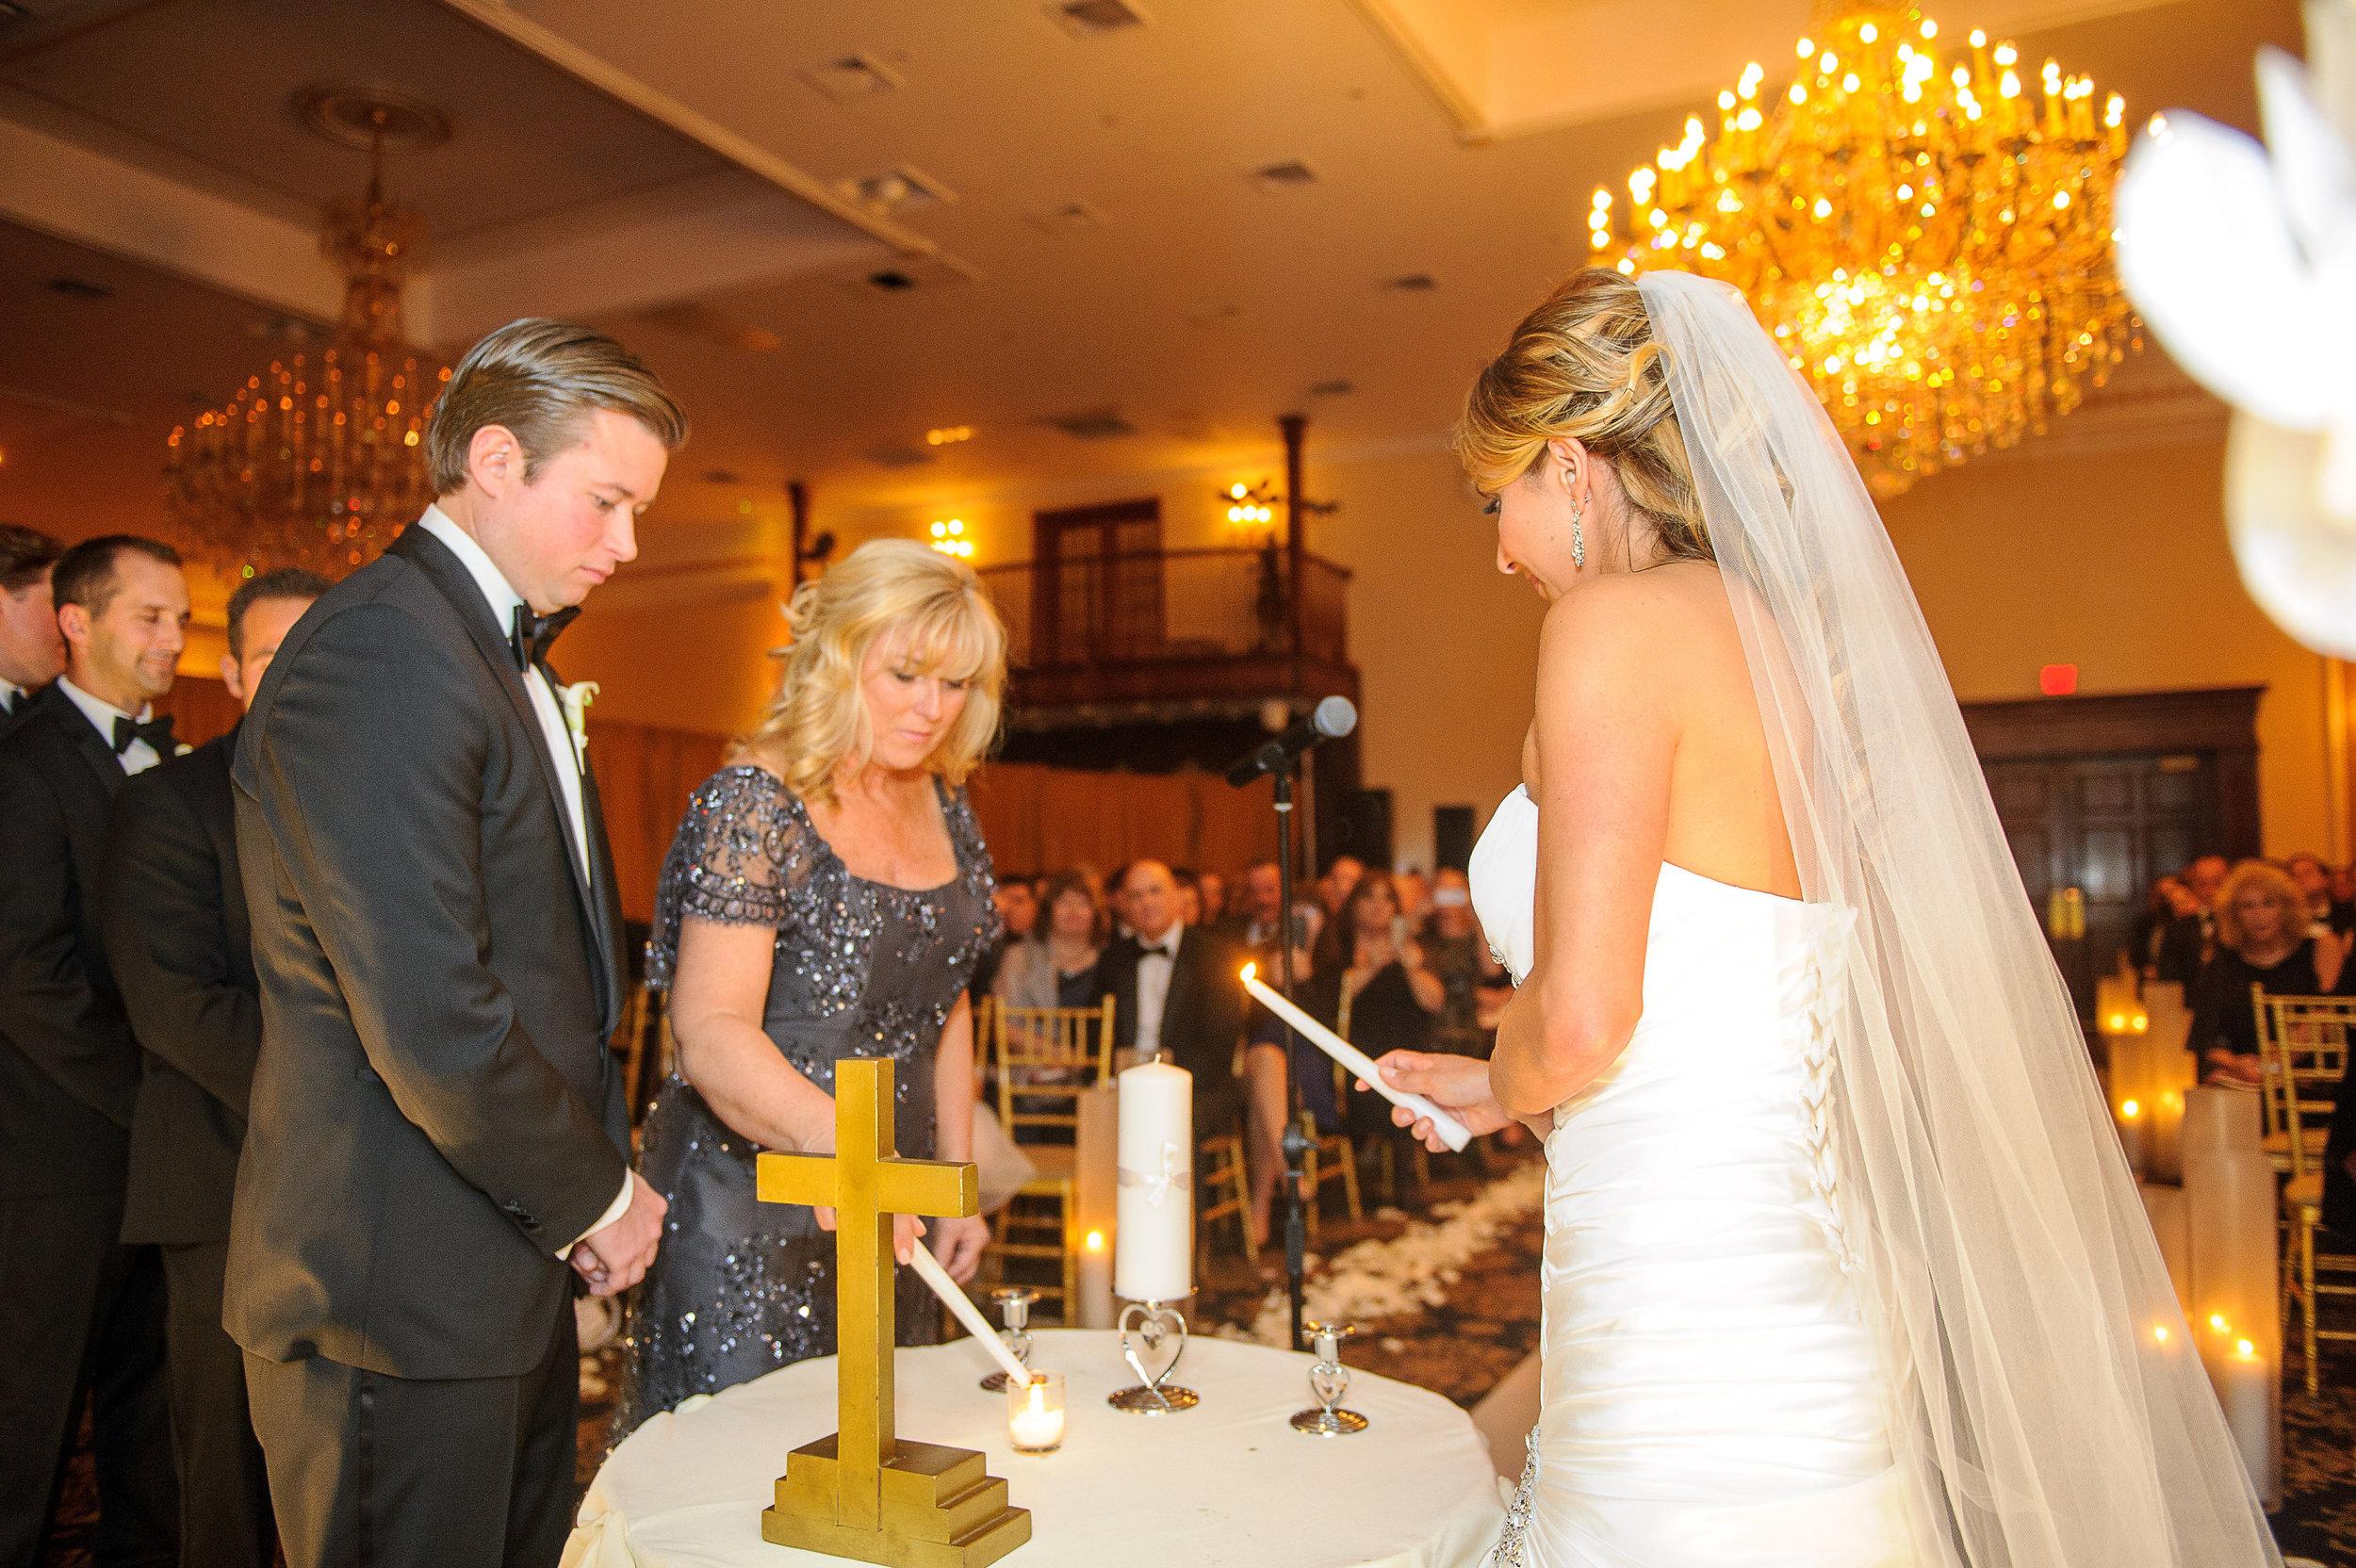 Ceci_New_York_Custom_Invitation_ New_Jersey_Wedding_Luxury_Personalized_Ceci_Style_Bride_Foil_Stamping111.JPG